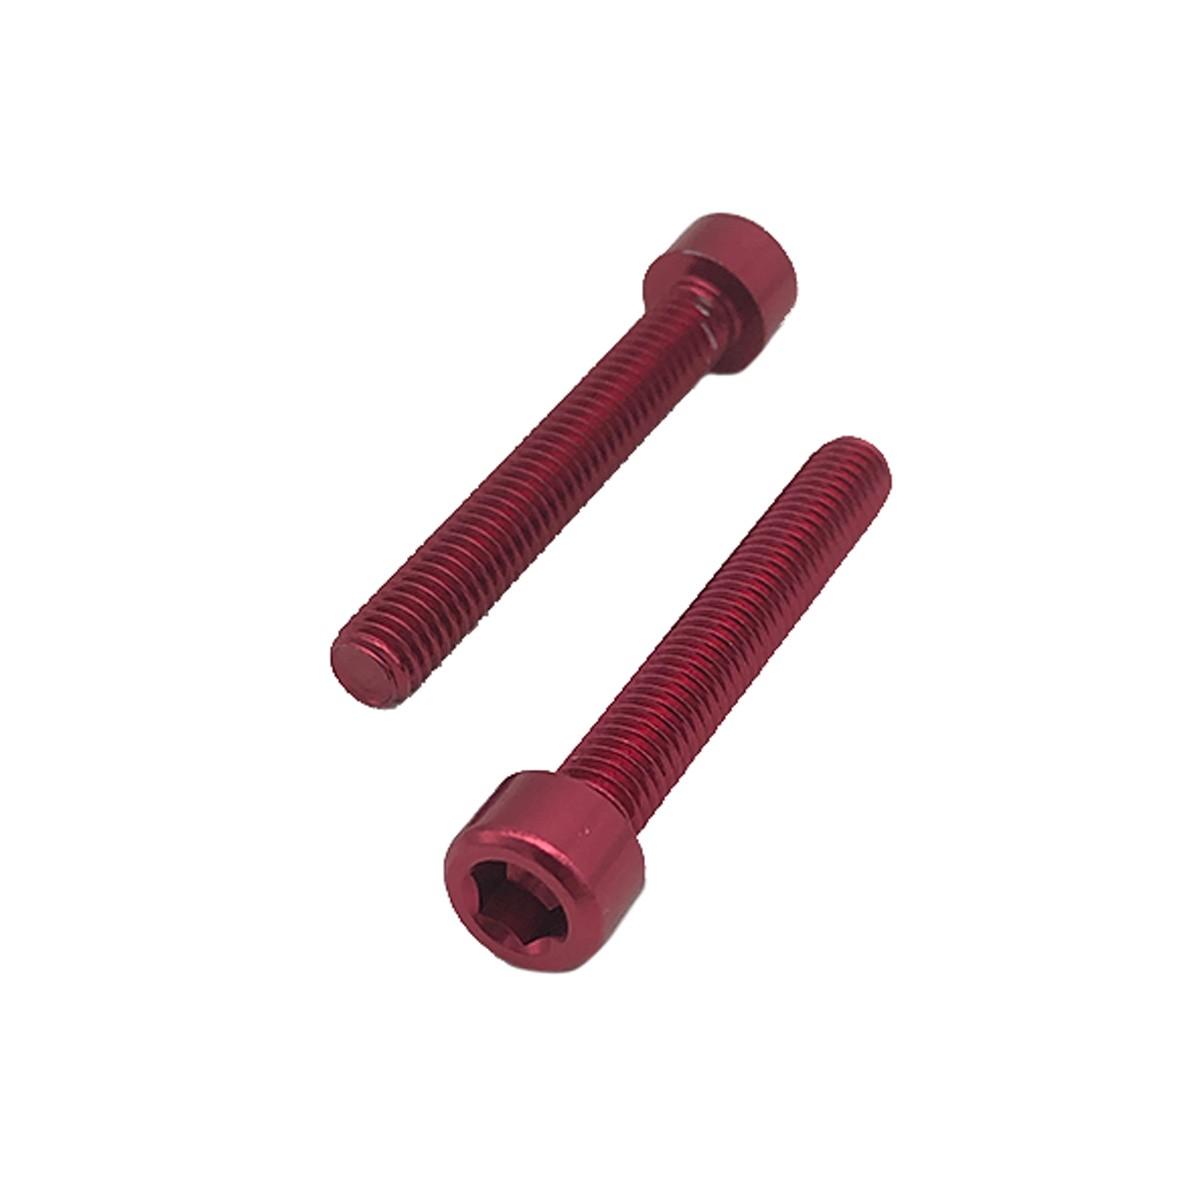 Parafuso Allen de Aluminio Socket Cap M5 x 30mm Unidade Vermelho